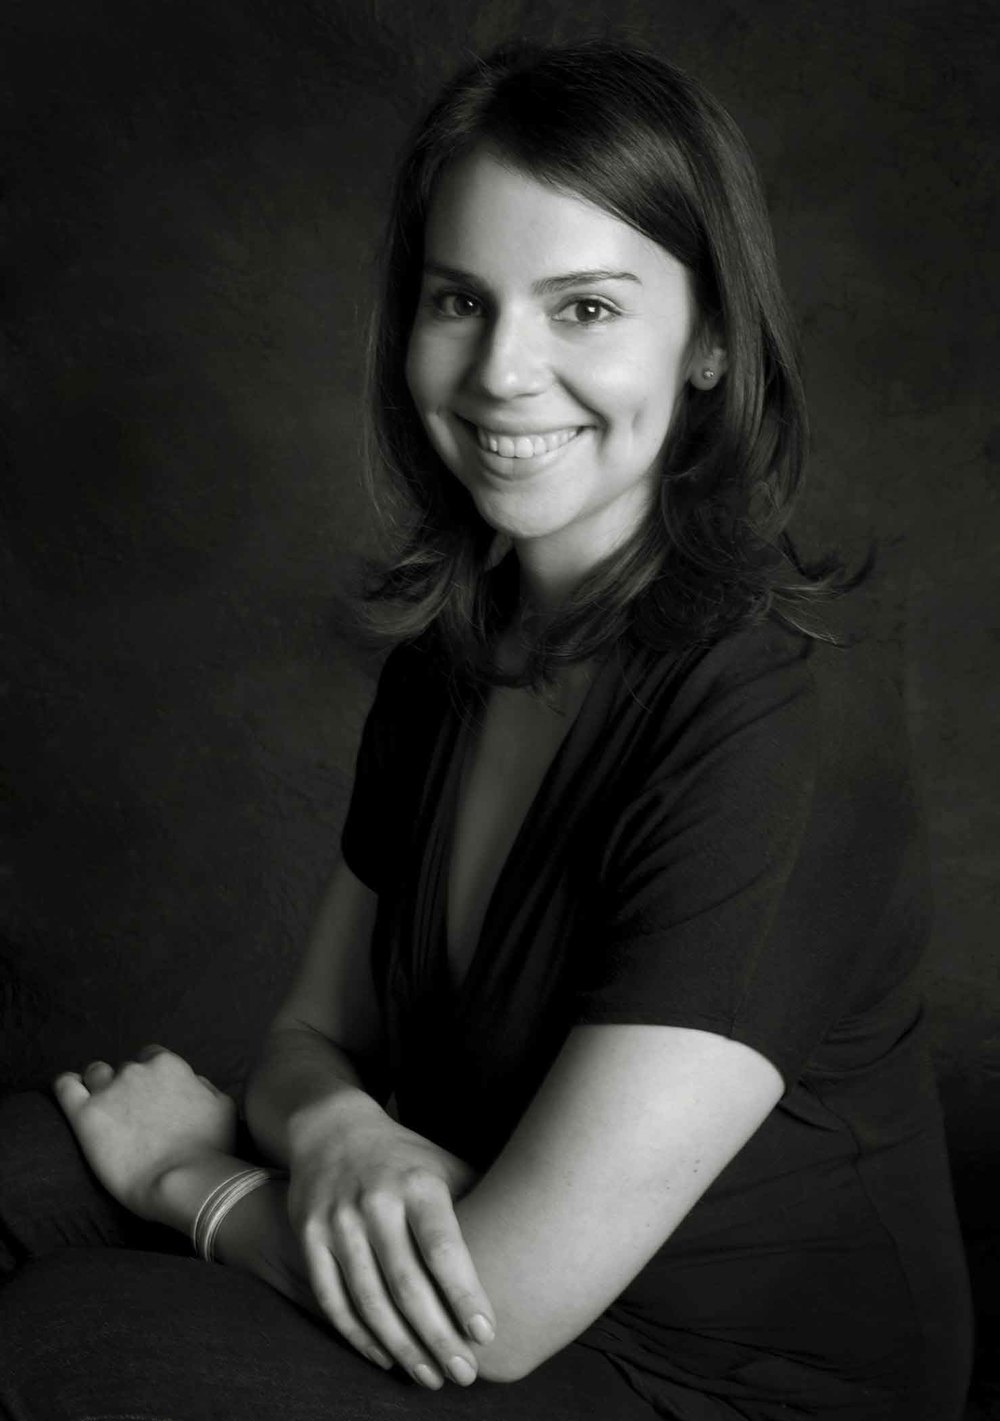 Katy L. | American Studies